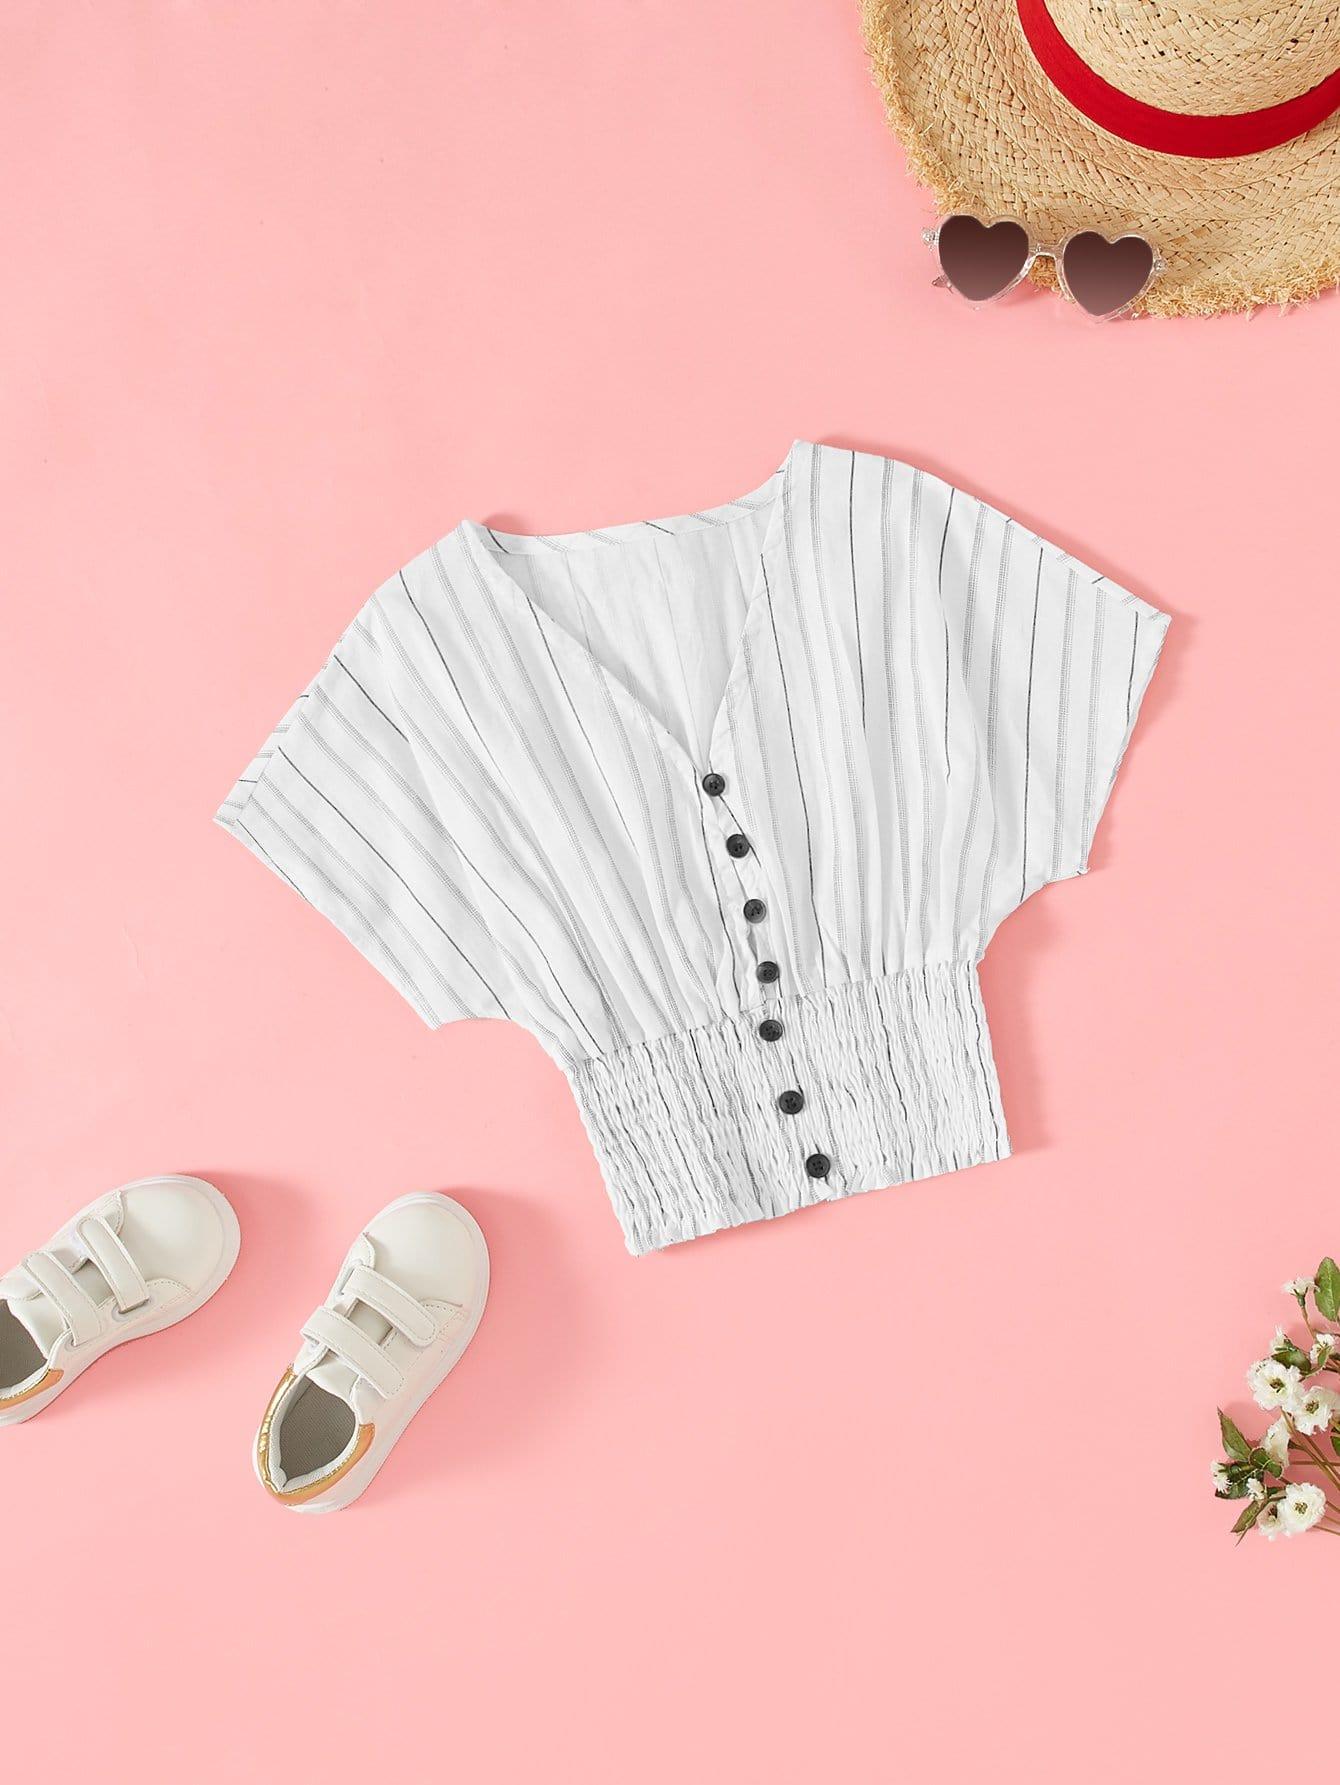 Batwing Sleeve Shirred Hem Button Up Полосатая блузка